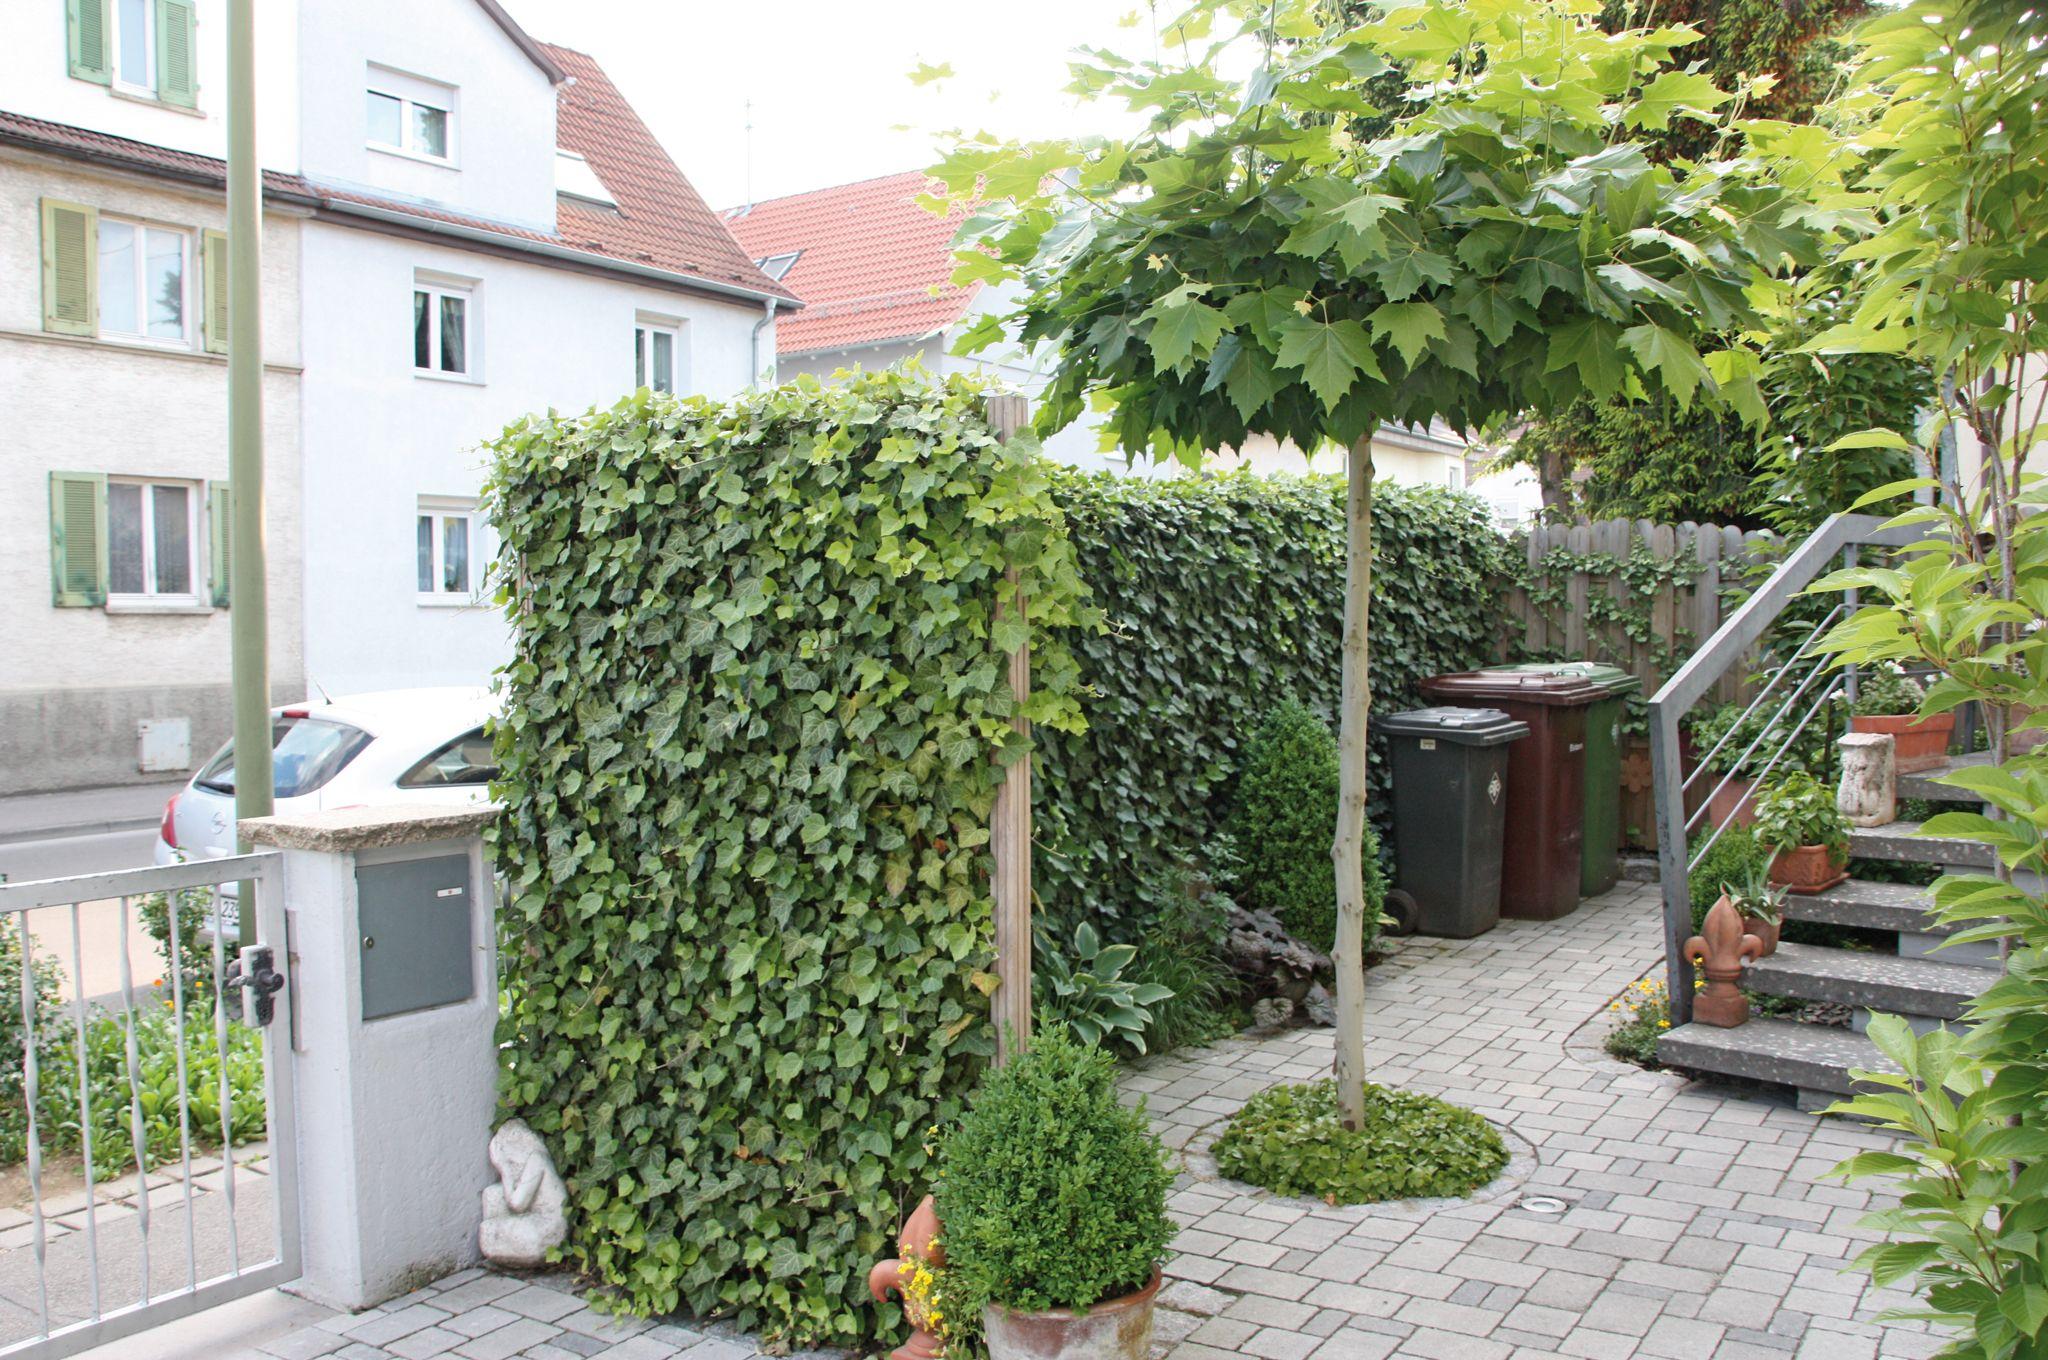 Bildergebnis Fur Hecke Laufender Meter Clematis Vorgarten